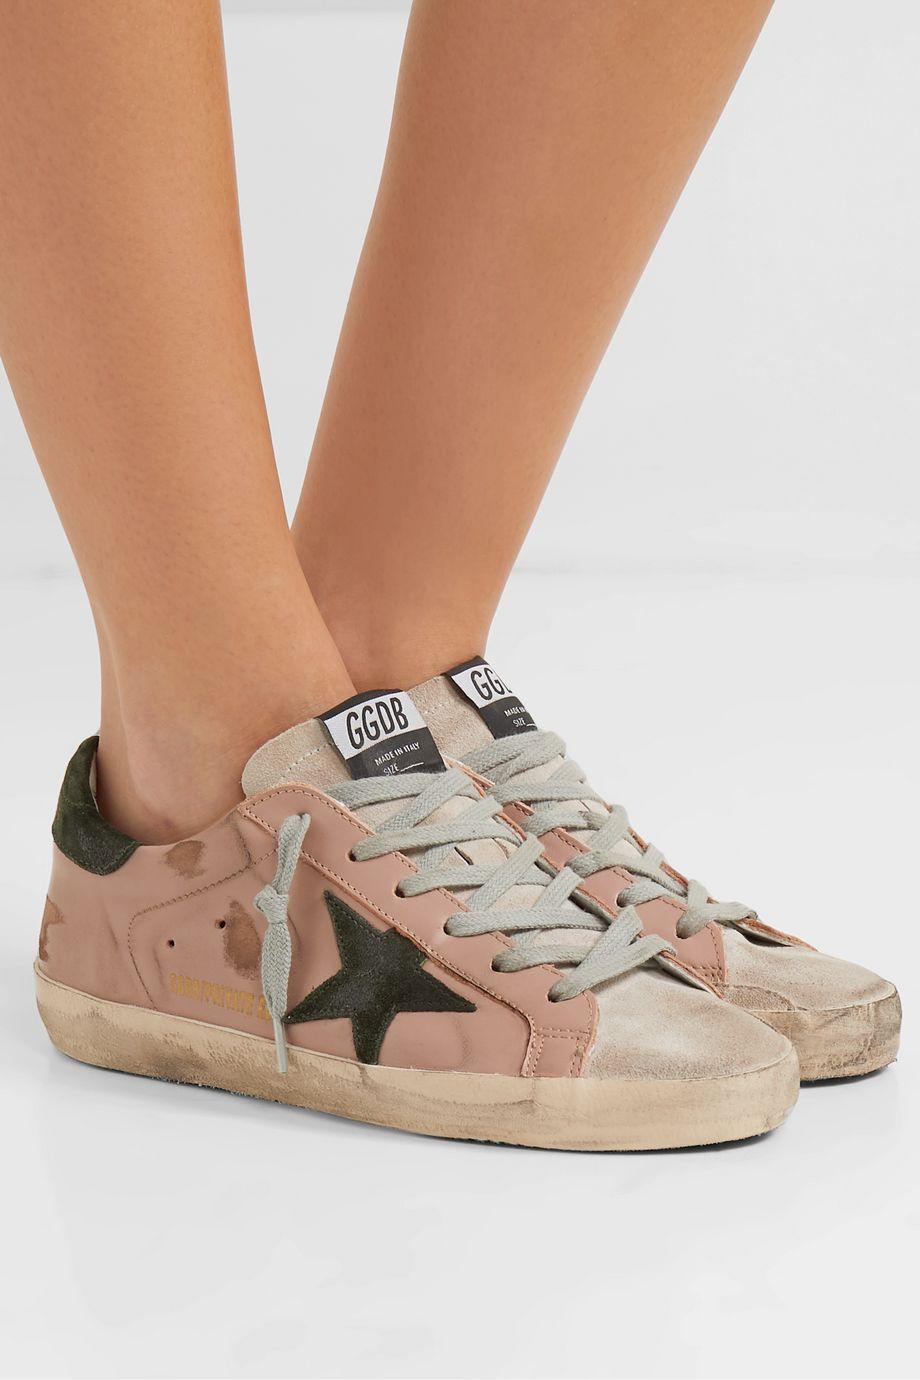 Golden Goose Superstar Sneakers aus Leder und Veloursleder in Distressed-Optik